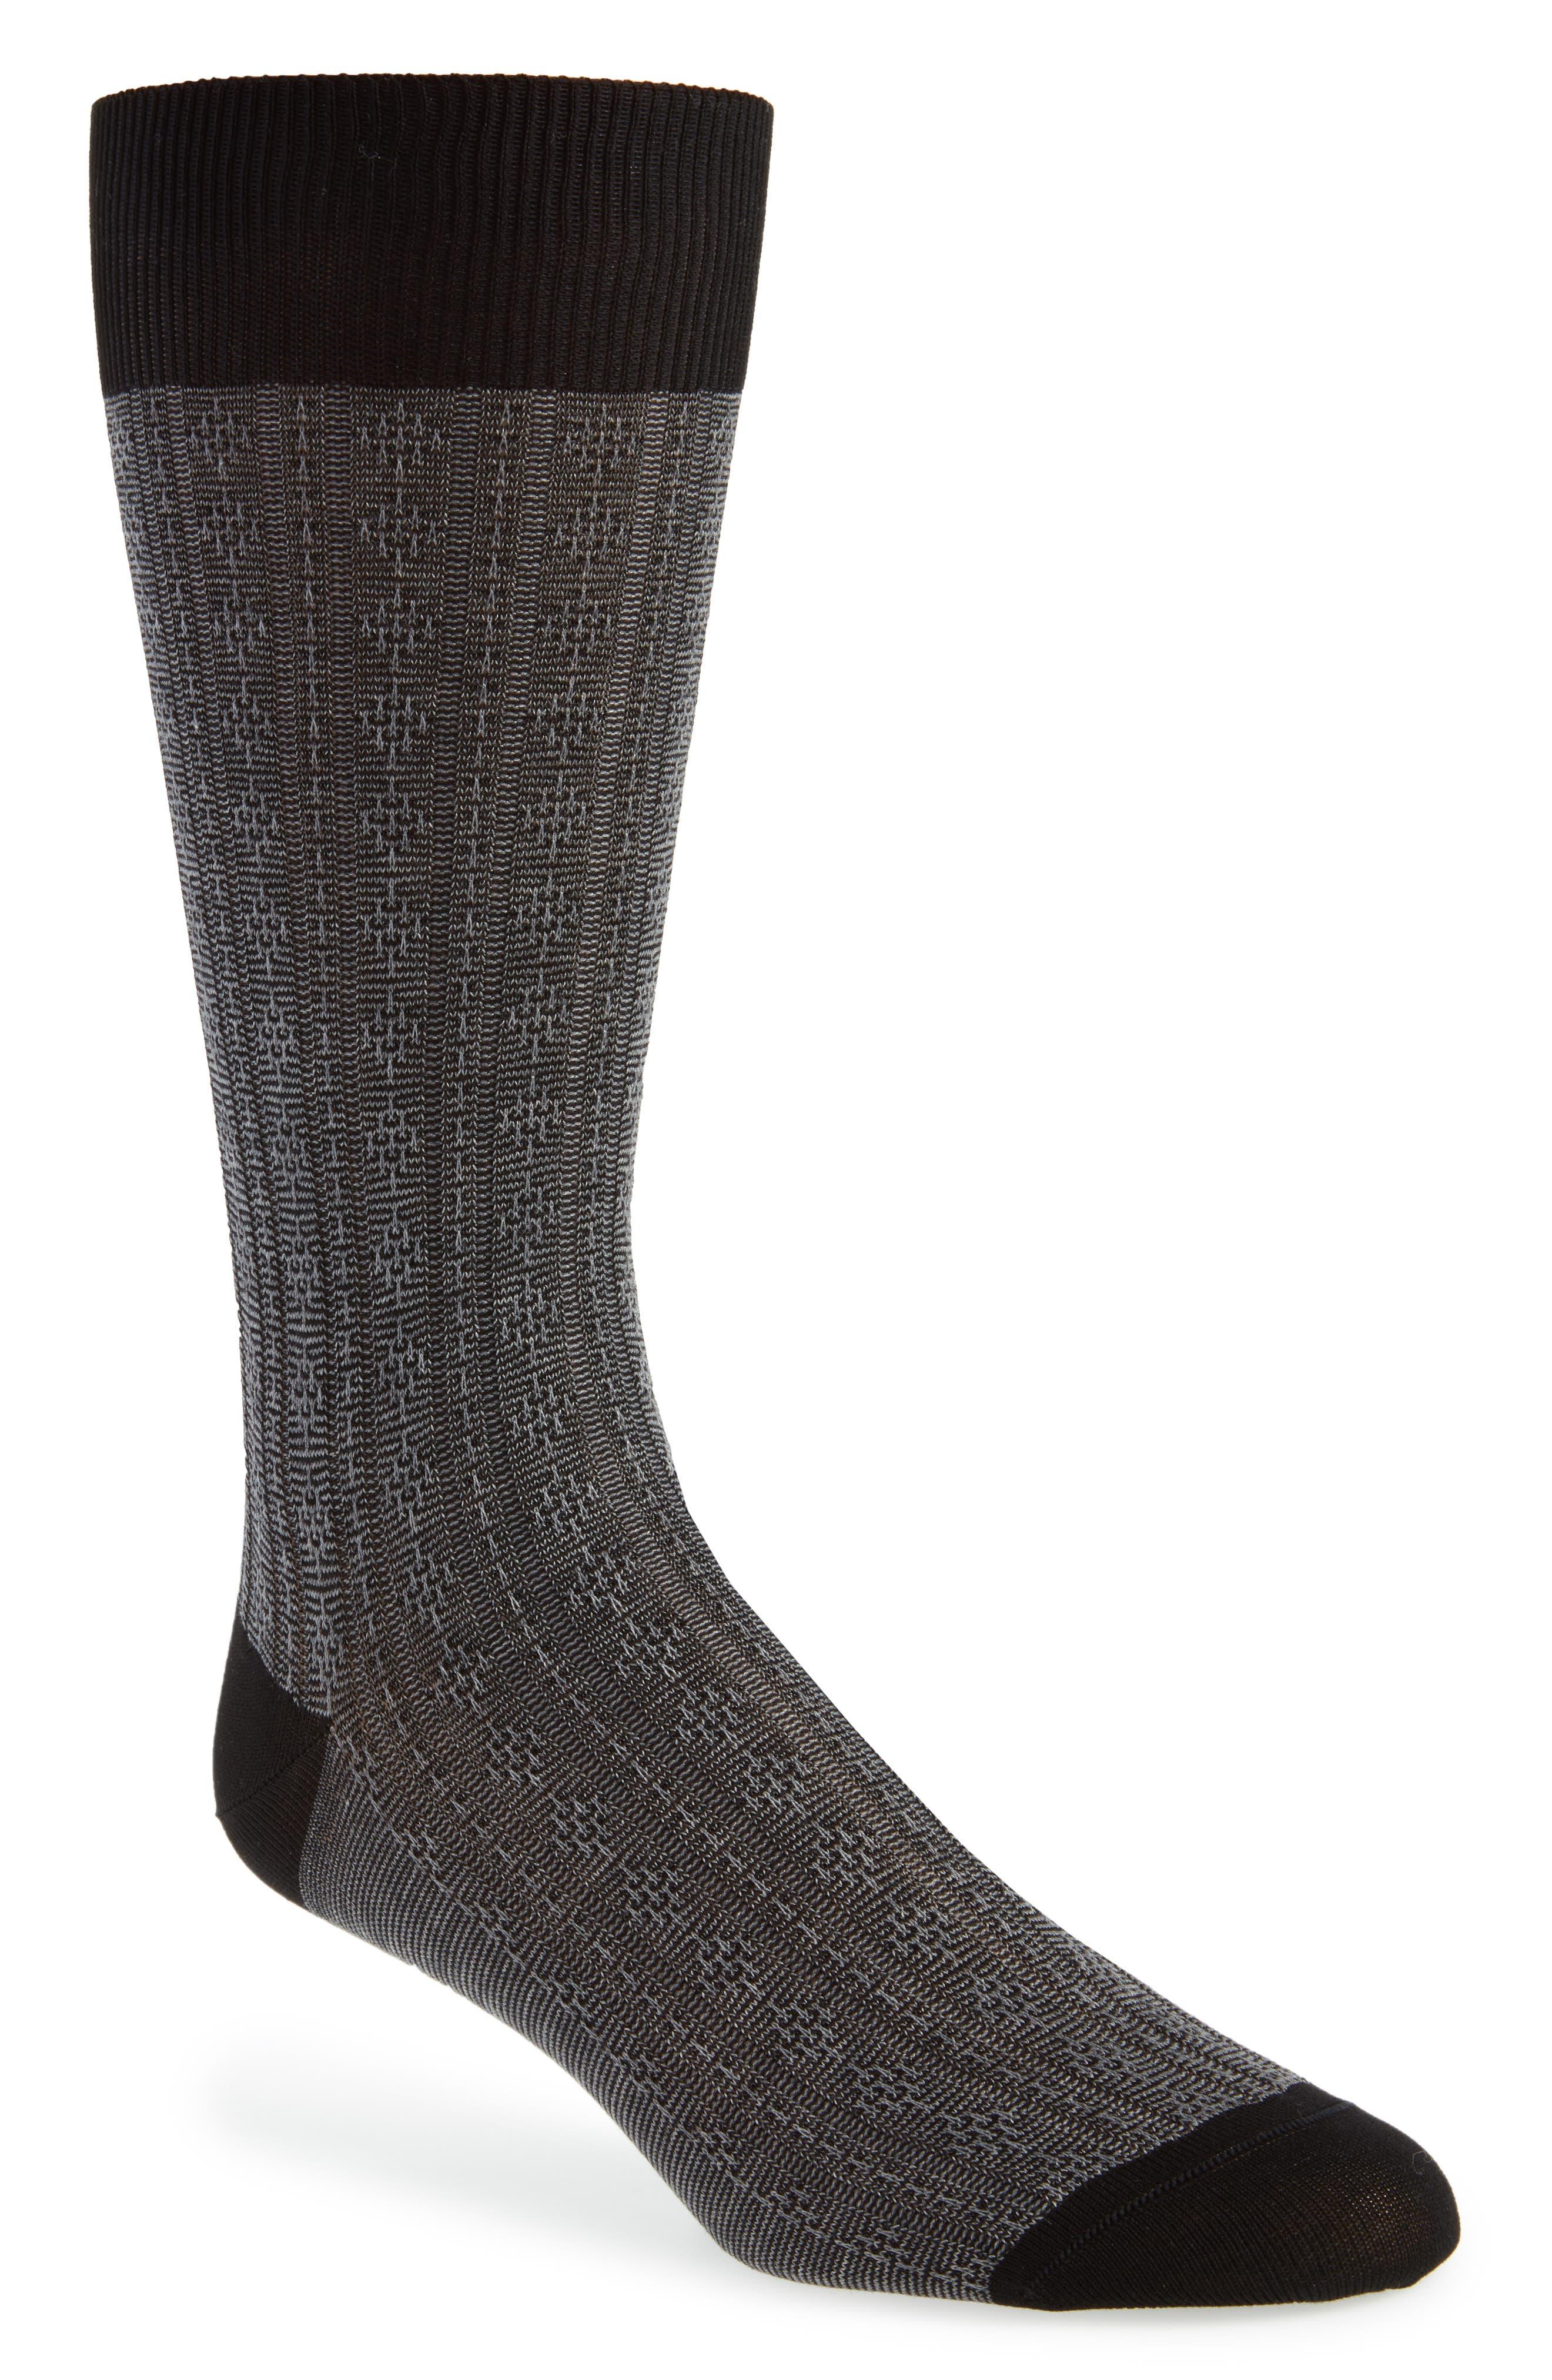 Atom Stitch Socks,                             Main thumbnail 1, color,                             001